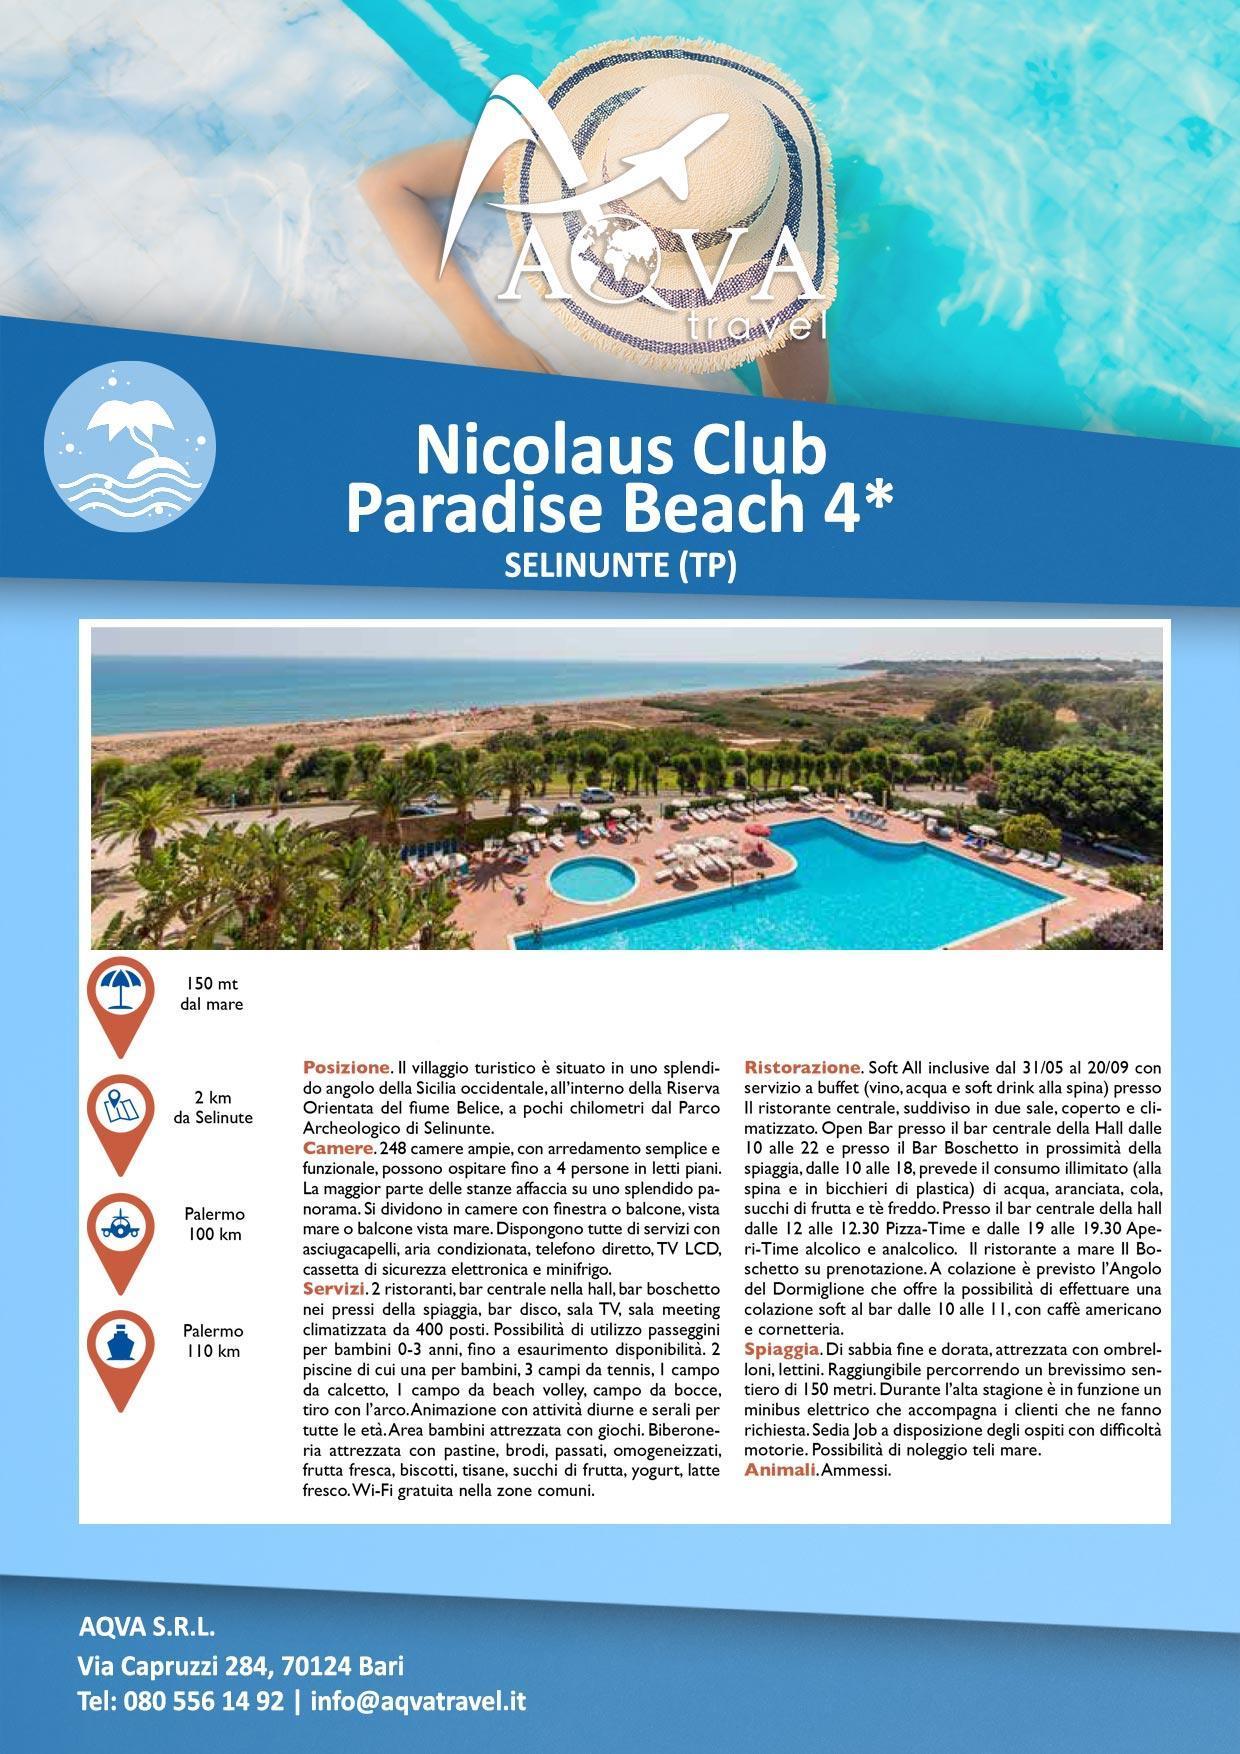 Nicolaus-Club-Paradise-Beach--Mare-offerte-agenzia-di-viaggi-Bari-AQVATRAVEL-it